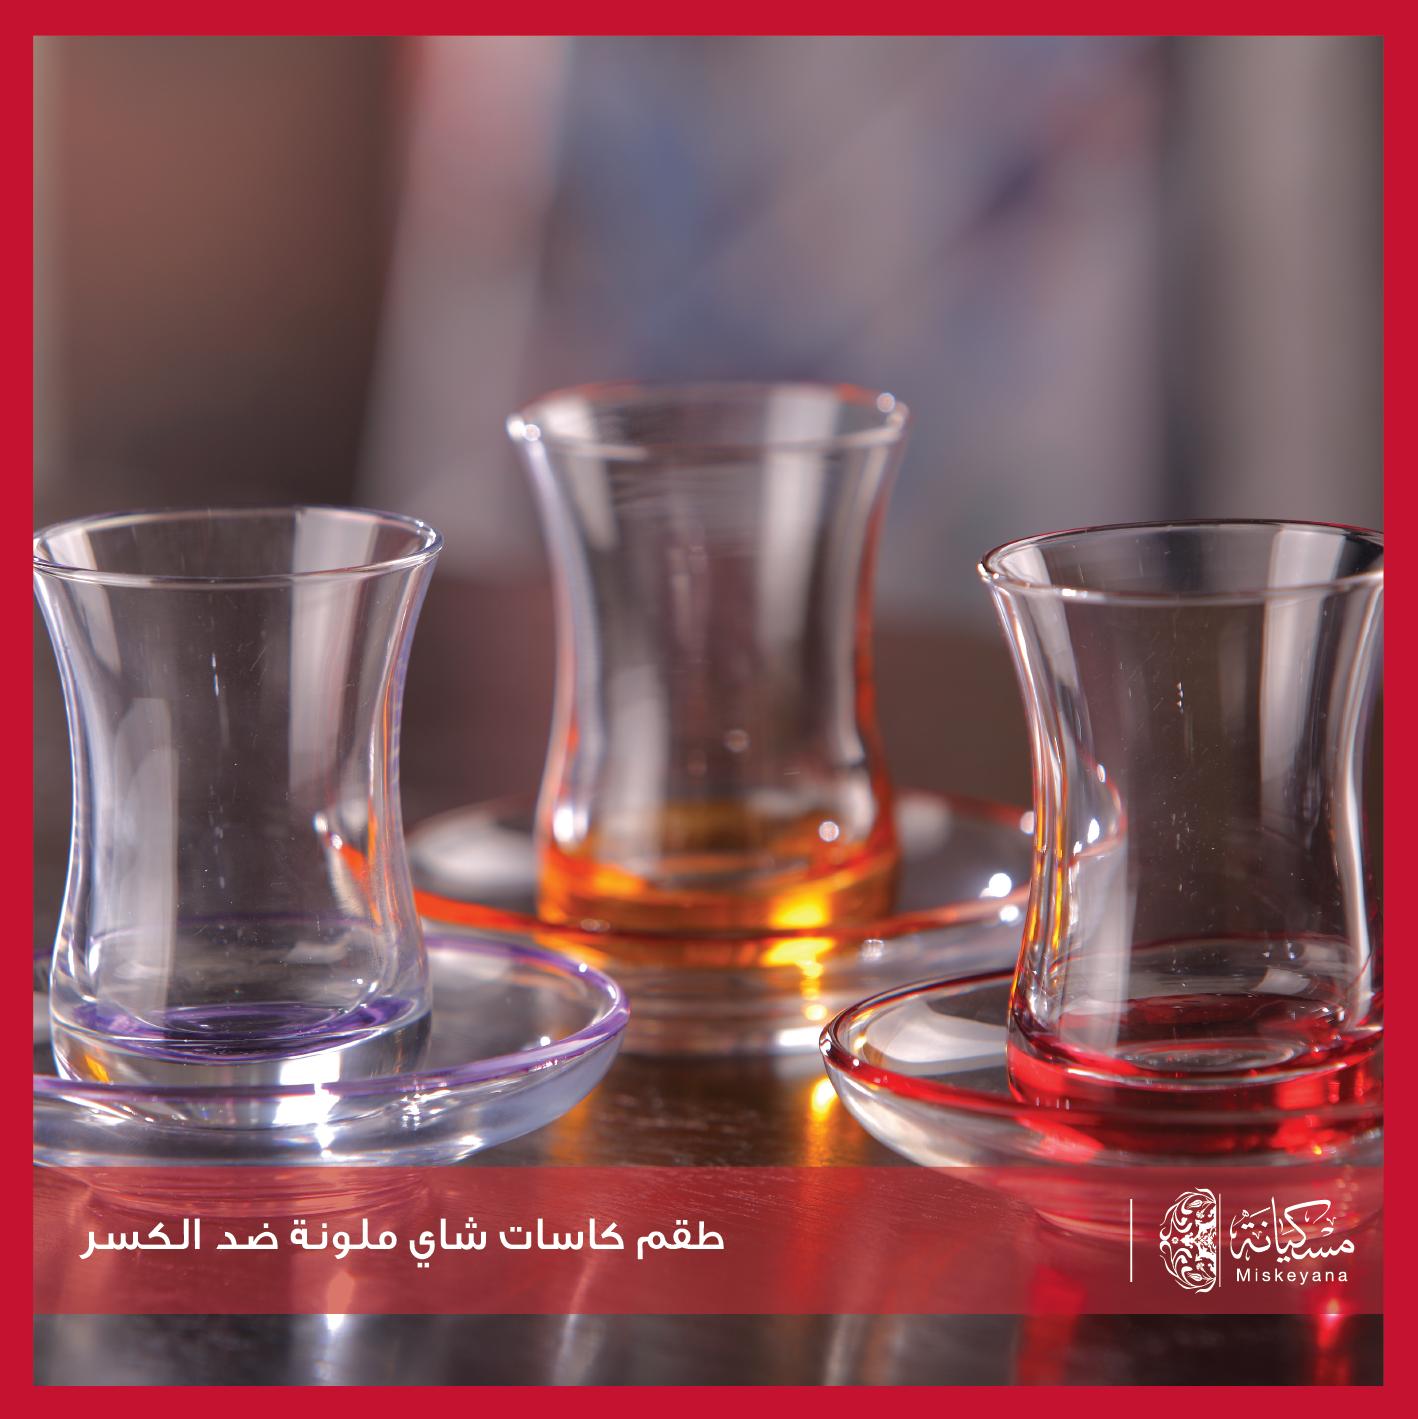 طقم عدد 6 كاسات شاي ضد الكسر ملونة Glassware Glass Tableware